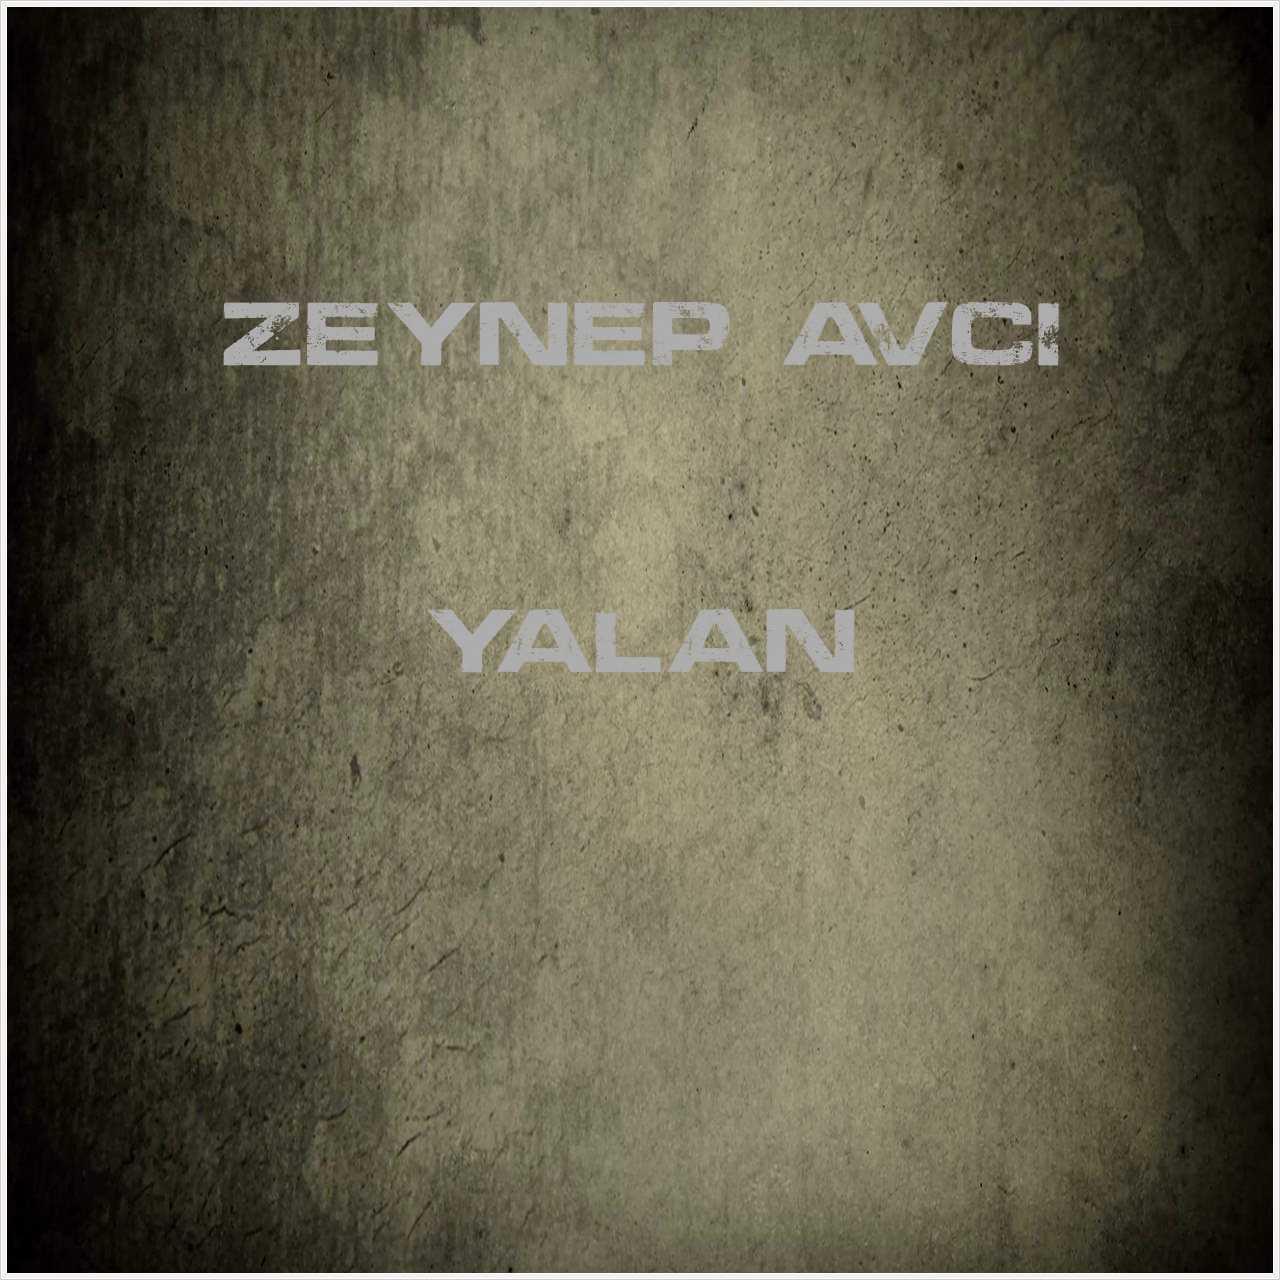 دانلود آهنگ جدید Zeynep Avcı به نام Yalan